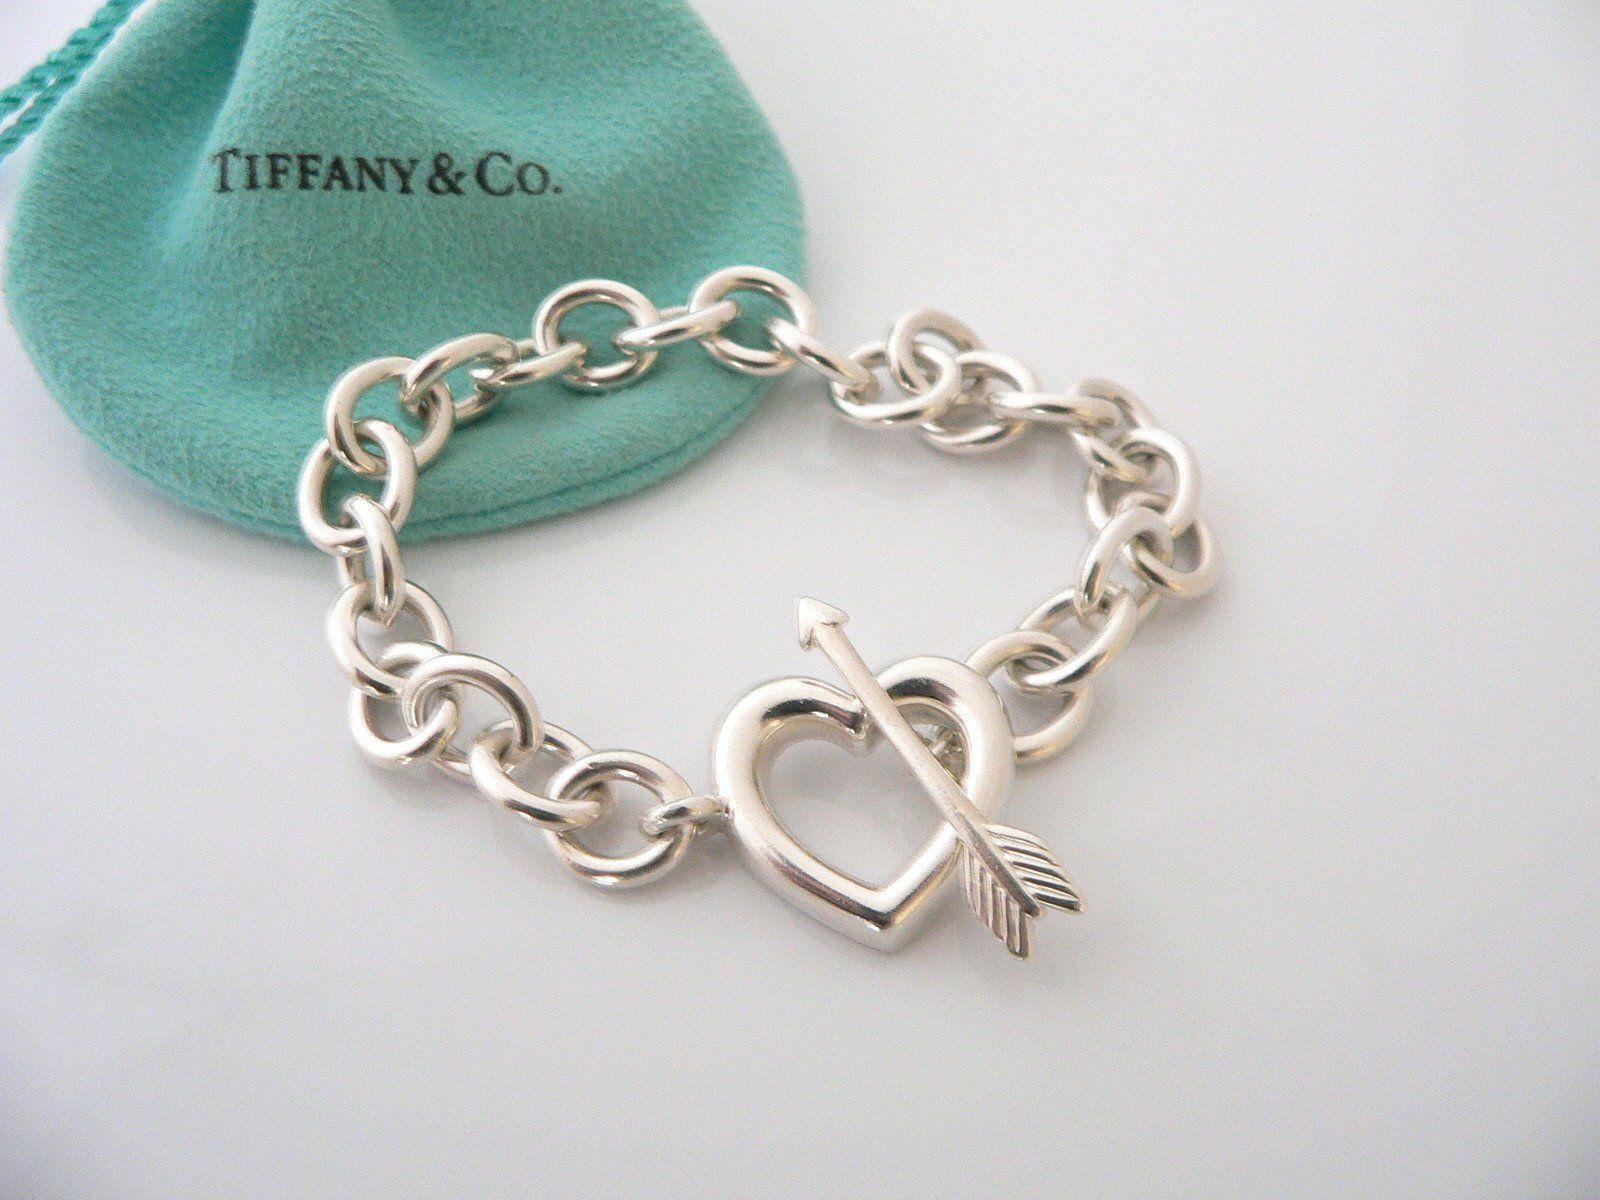 ca97d861f Tiffany & Co Silver Heart Arrow Toggle Bracelet Bangle Chain Rare ...